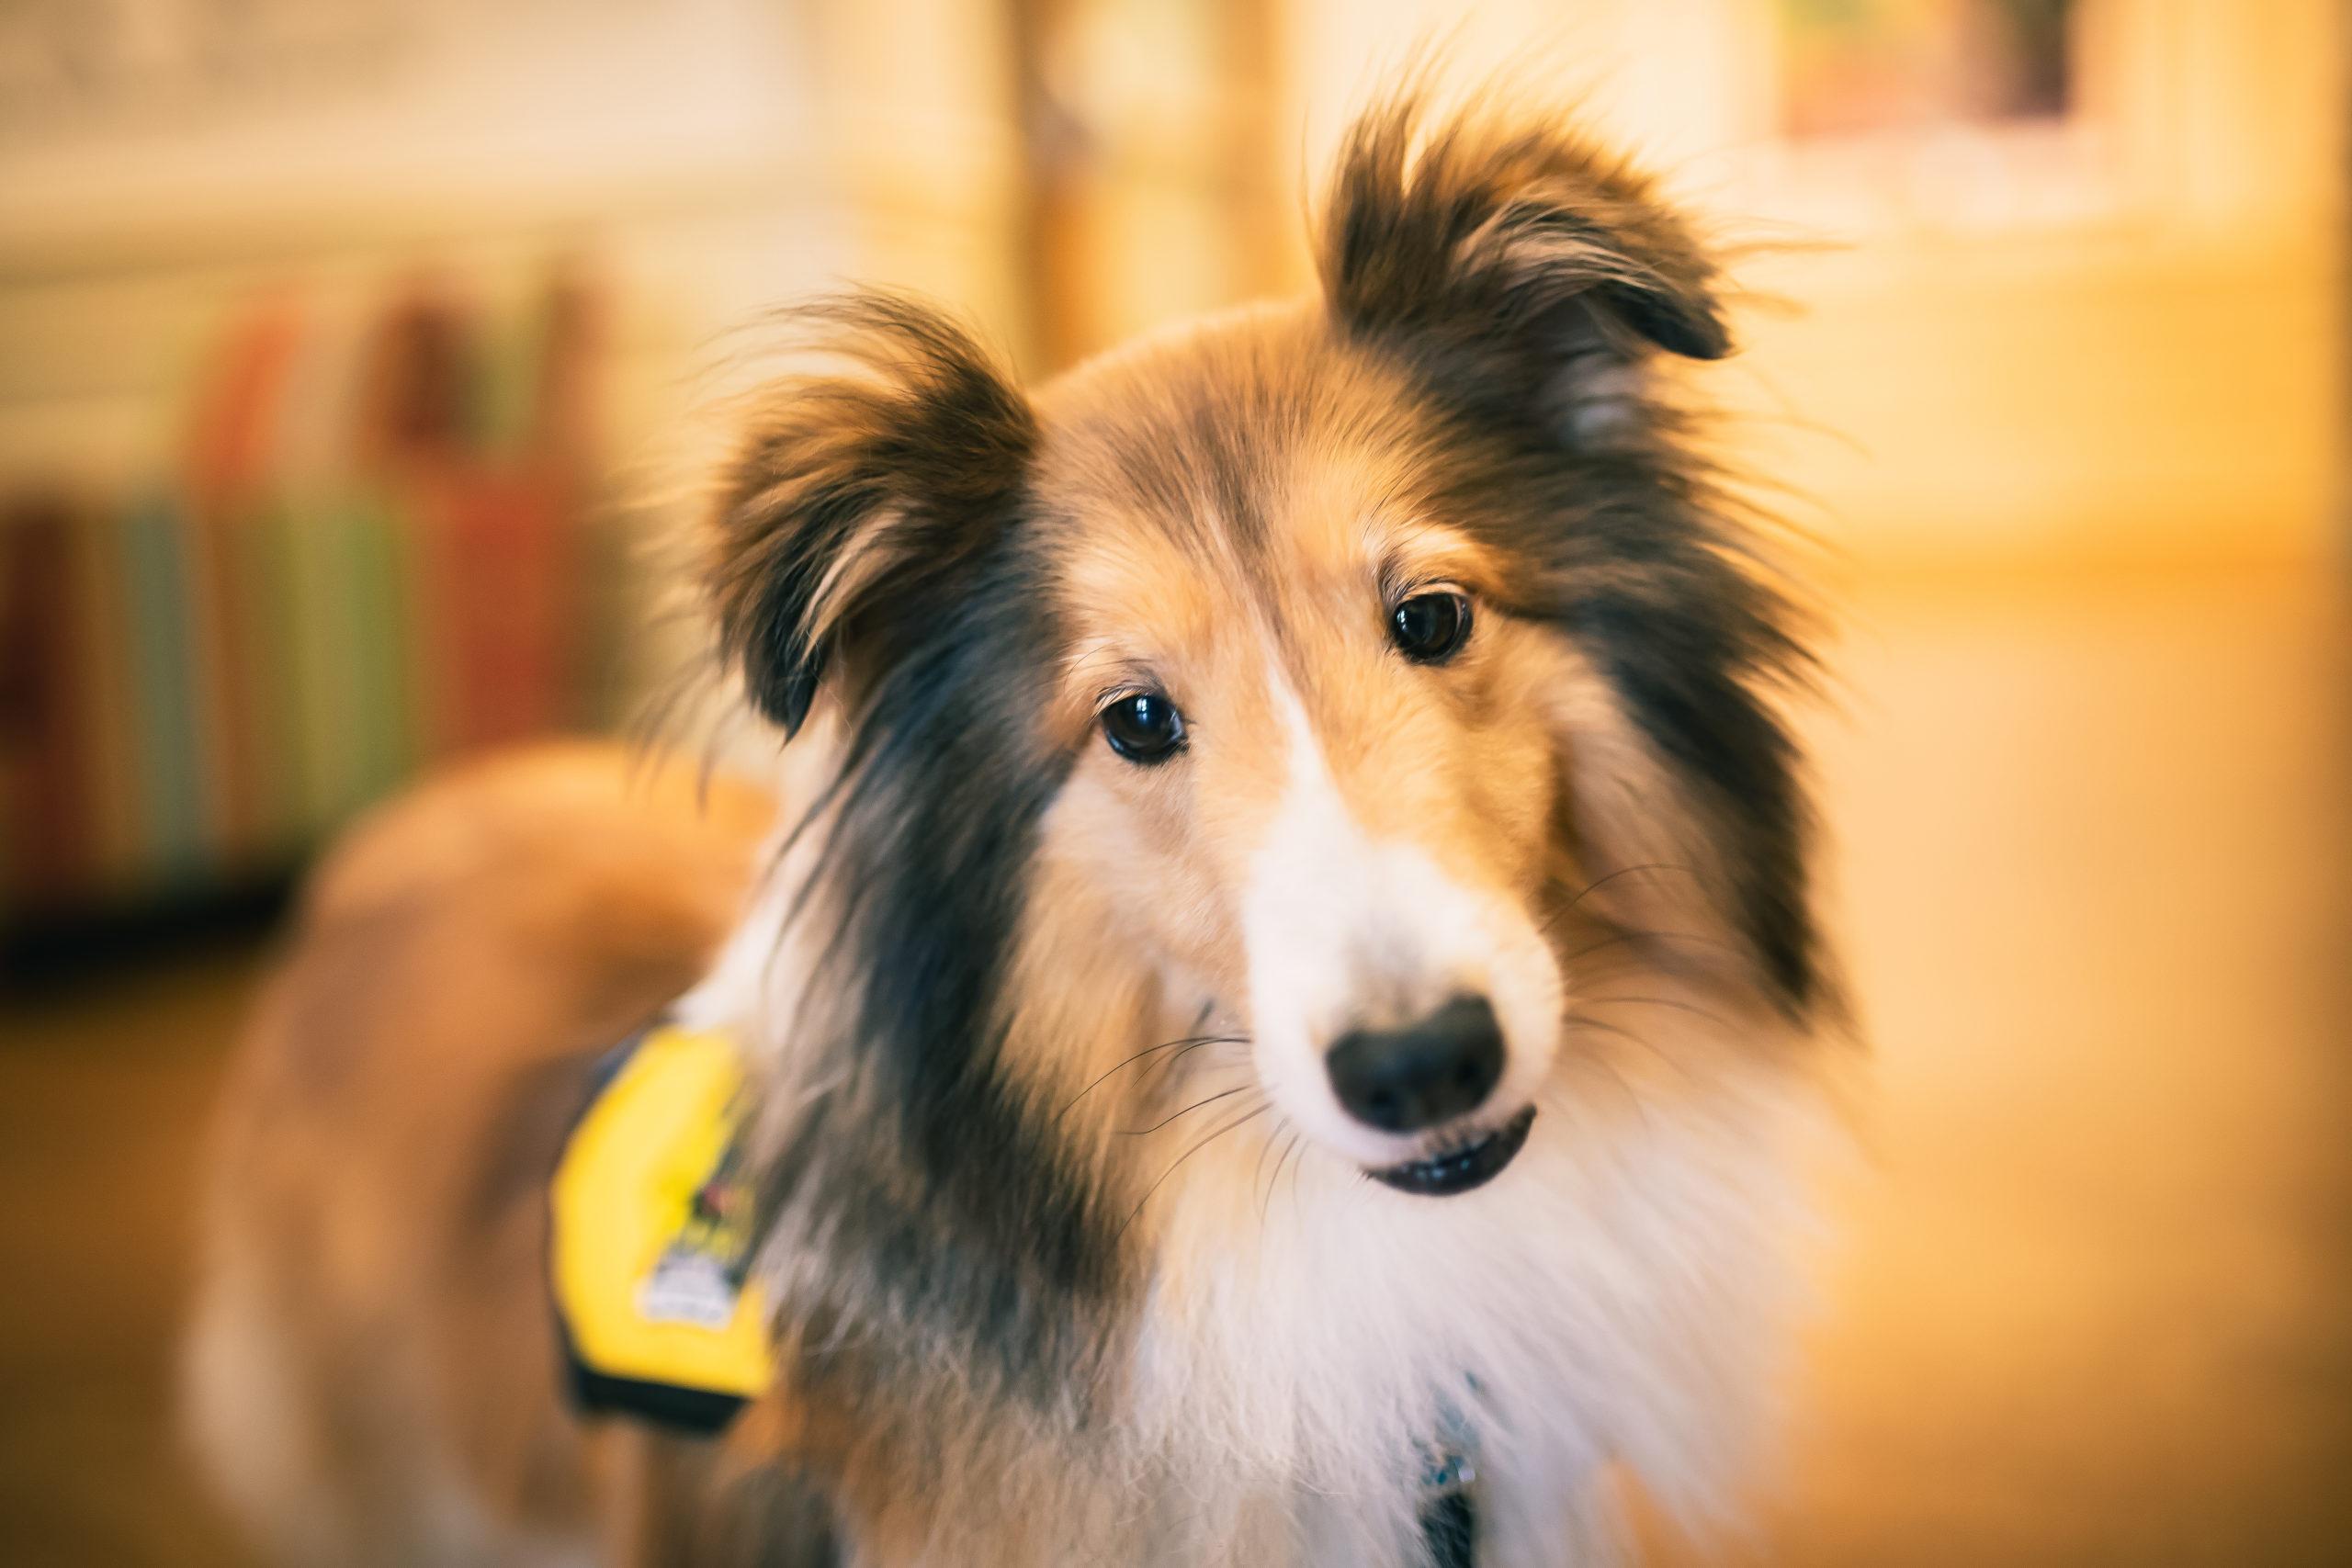 Should Own a Pet Dog